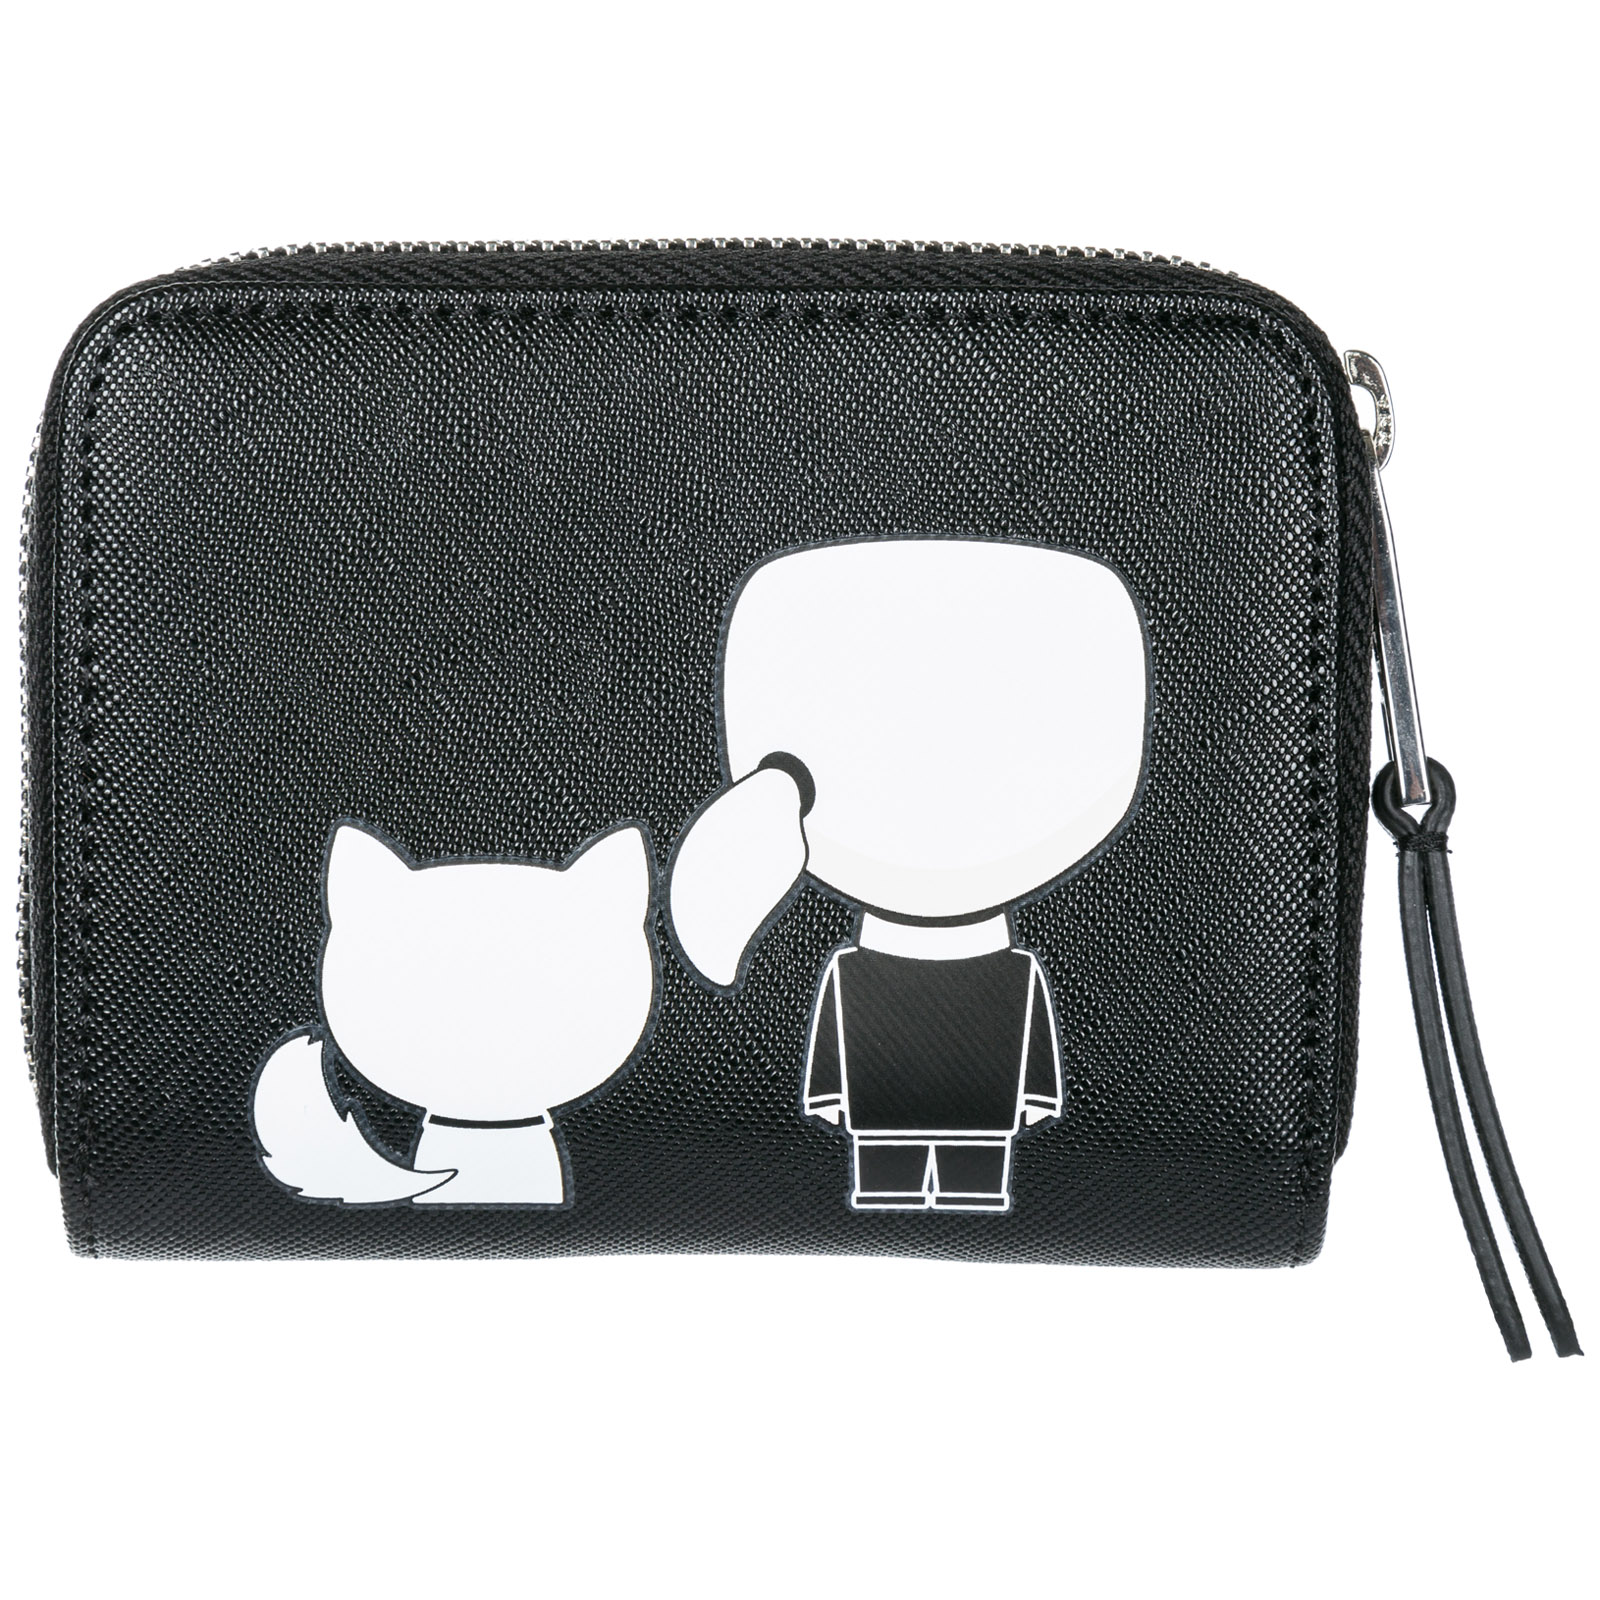 Women's wallet credit card trifold  k/ikonik